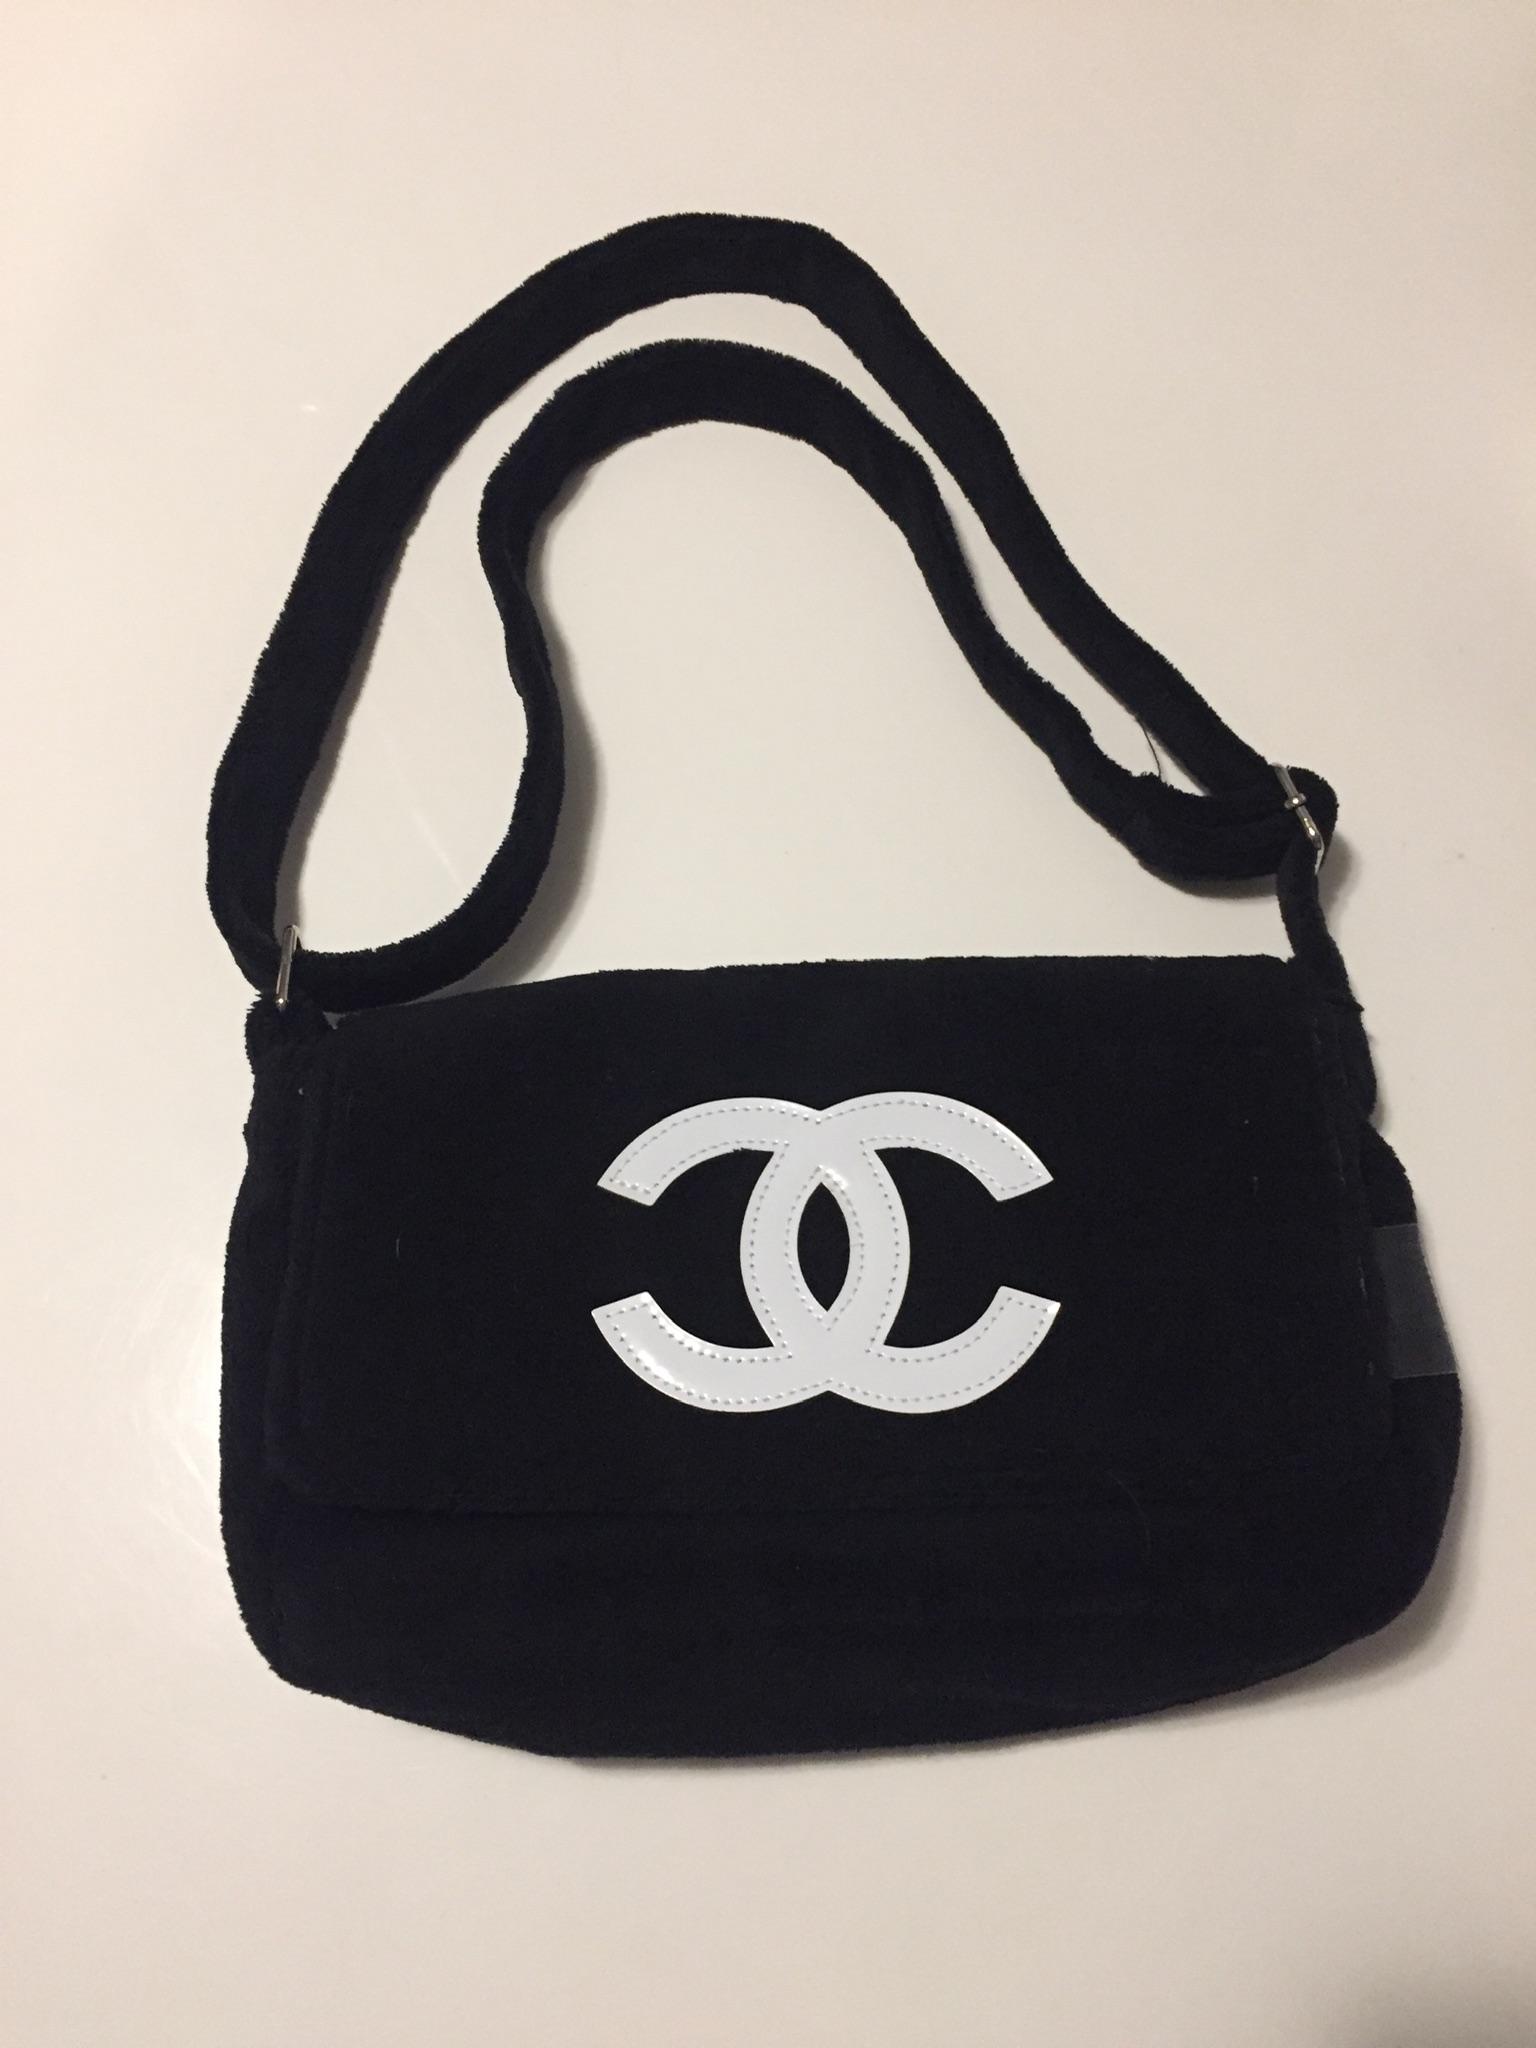 bc386134ecfa Chanel Chanel Fluffy Vip Shoulder Bag